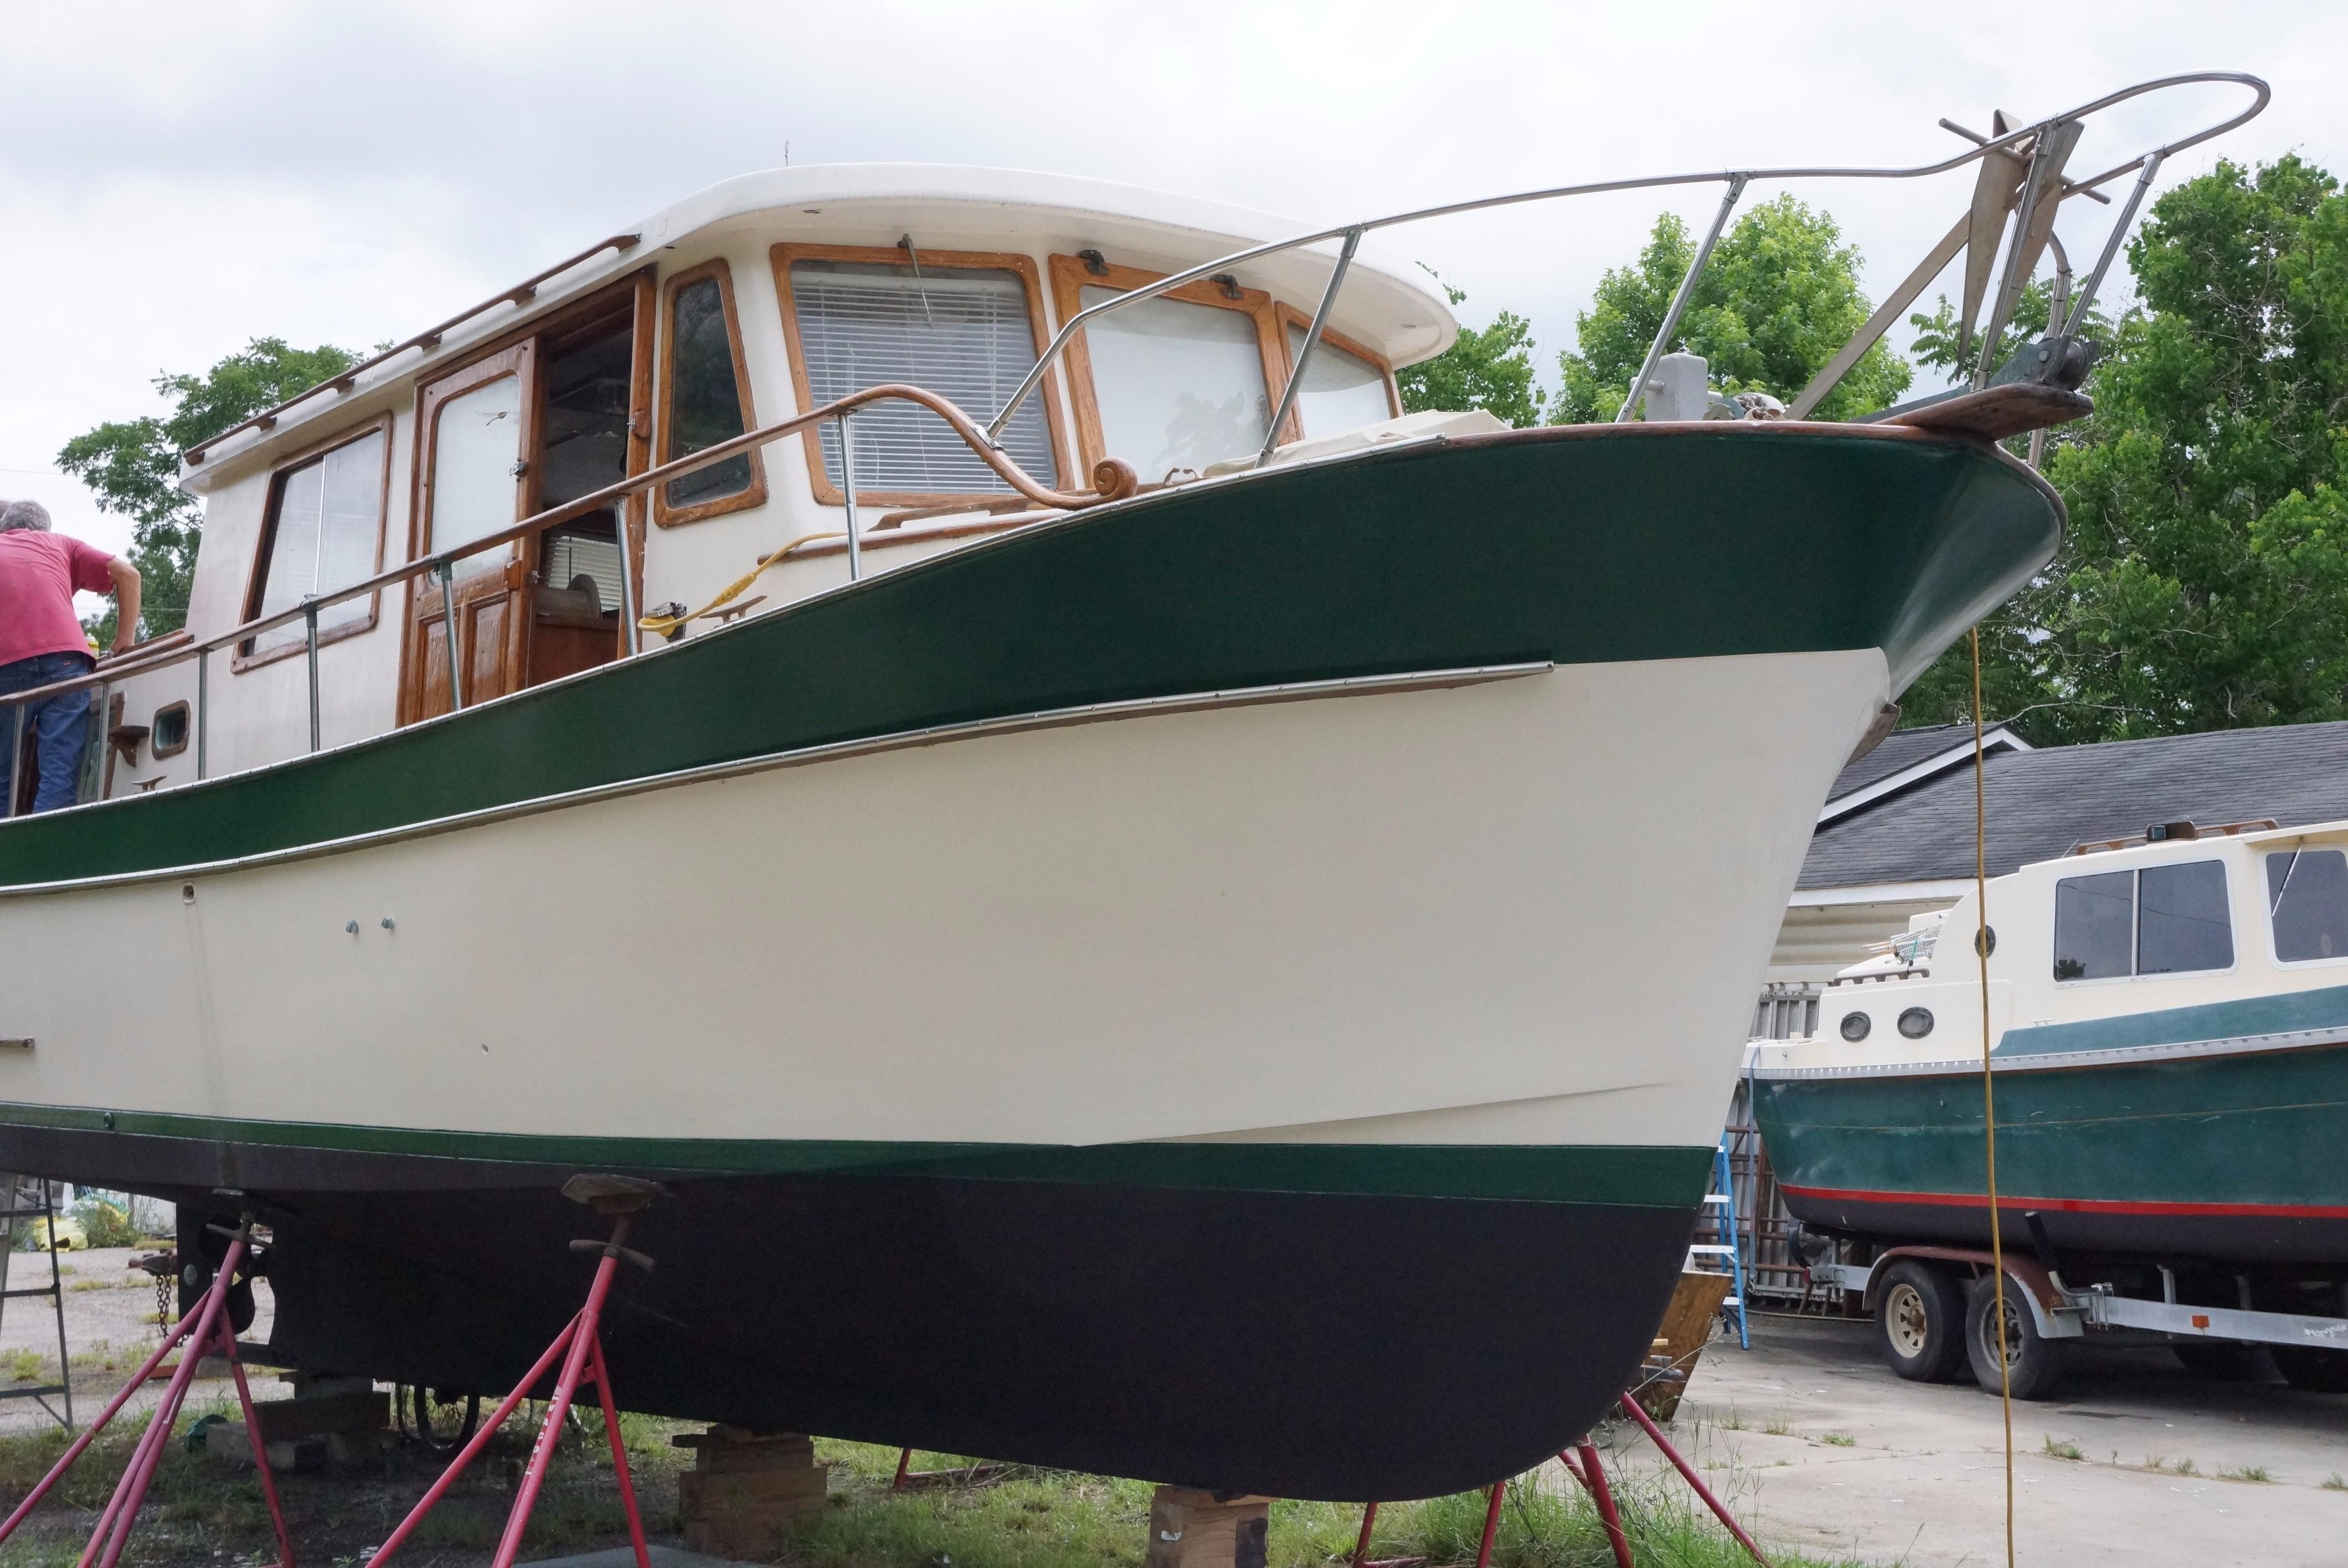 Marine Trader 34 Double Cabin - 34 Marine Trader Starboard Fwd Profile